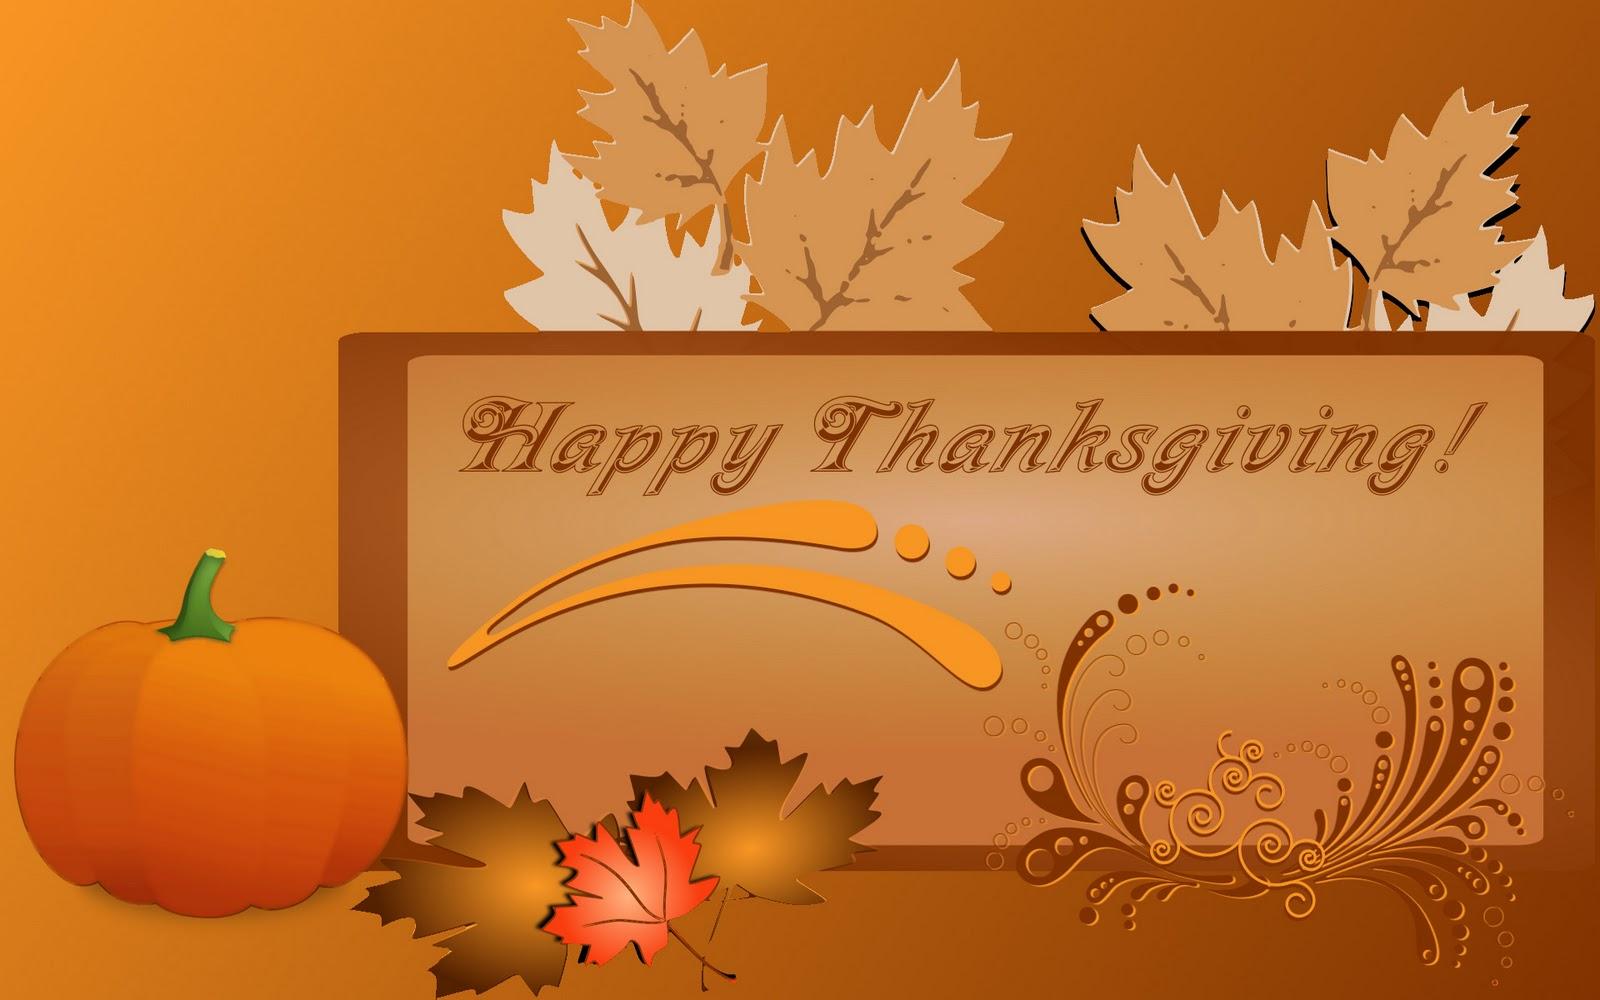 Desktop Backgrounds Thanksgiving - WallpaperSafari